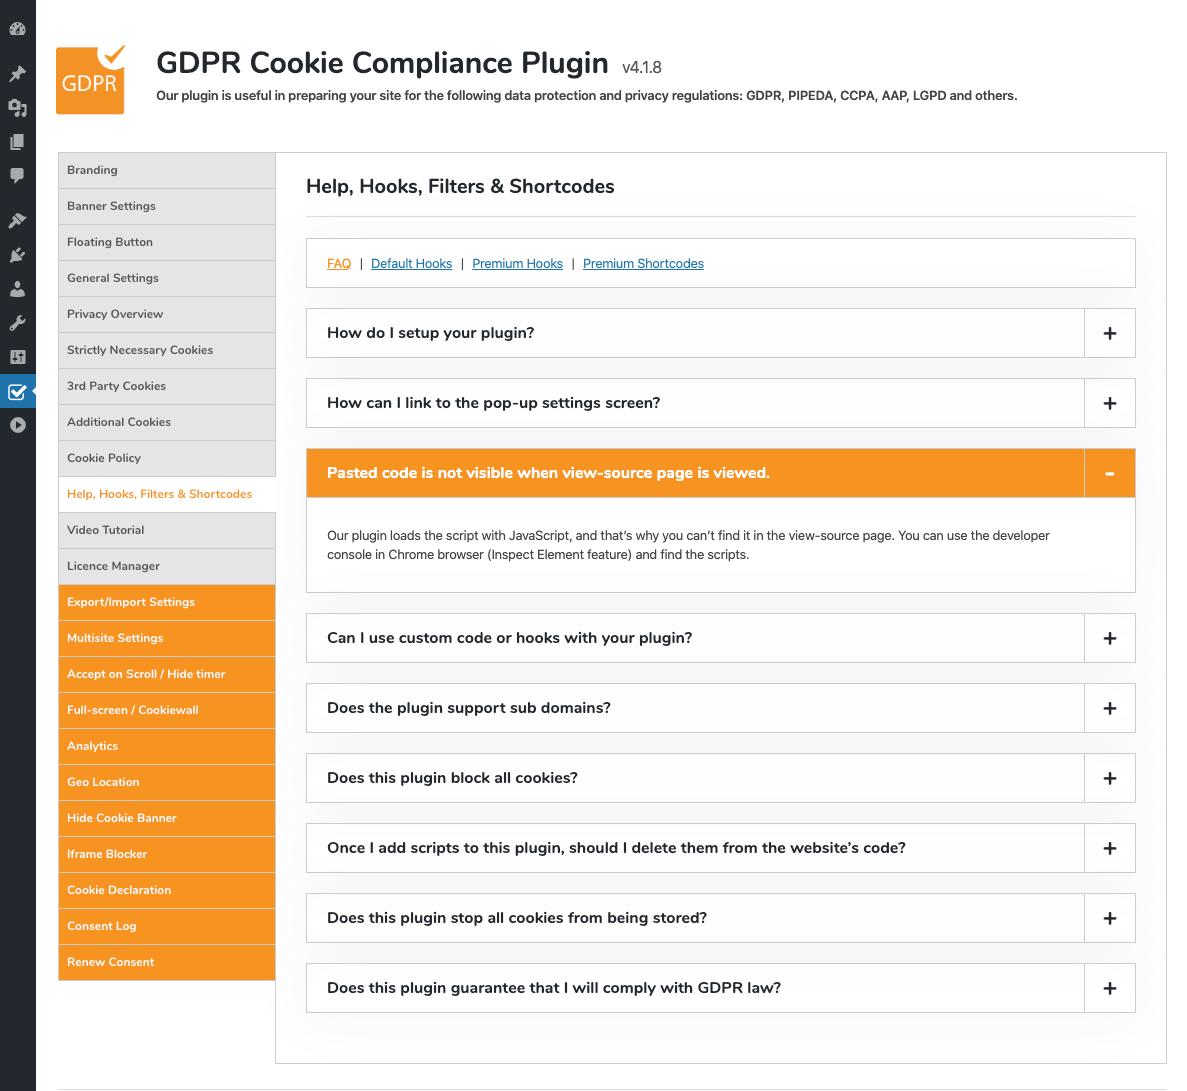 GDPR Cookie Compliance - Admin - Help - FAQ